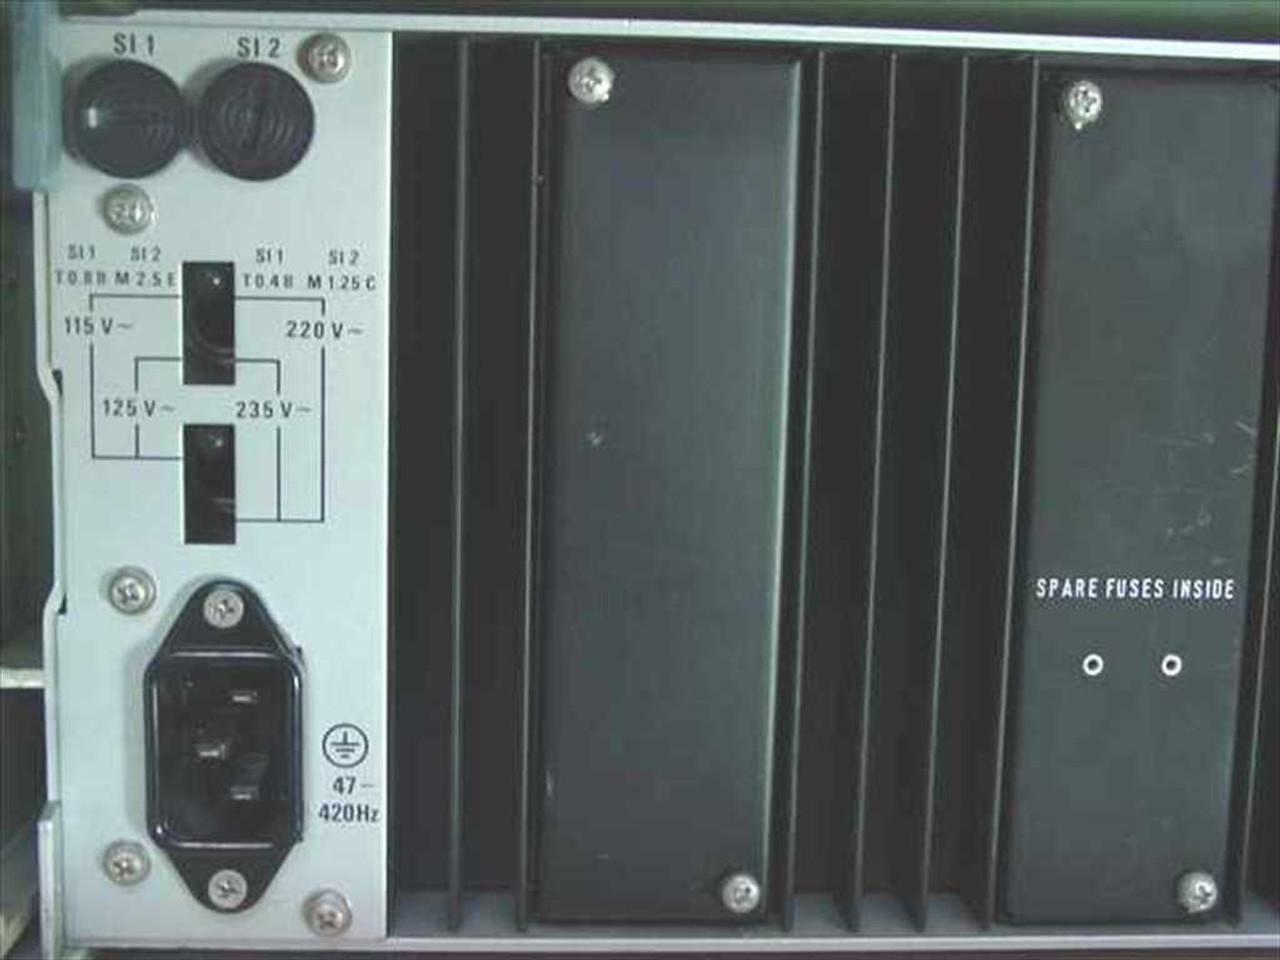 Wiring Diagram Also Ac Ammeter Wiring Diagram On Pump 110v Wiring